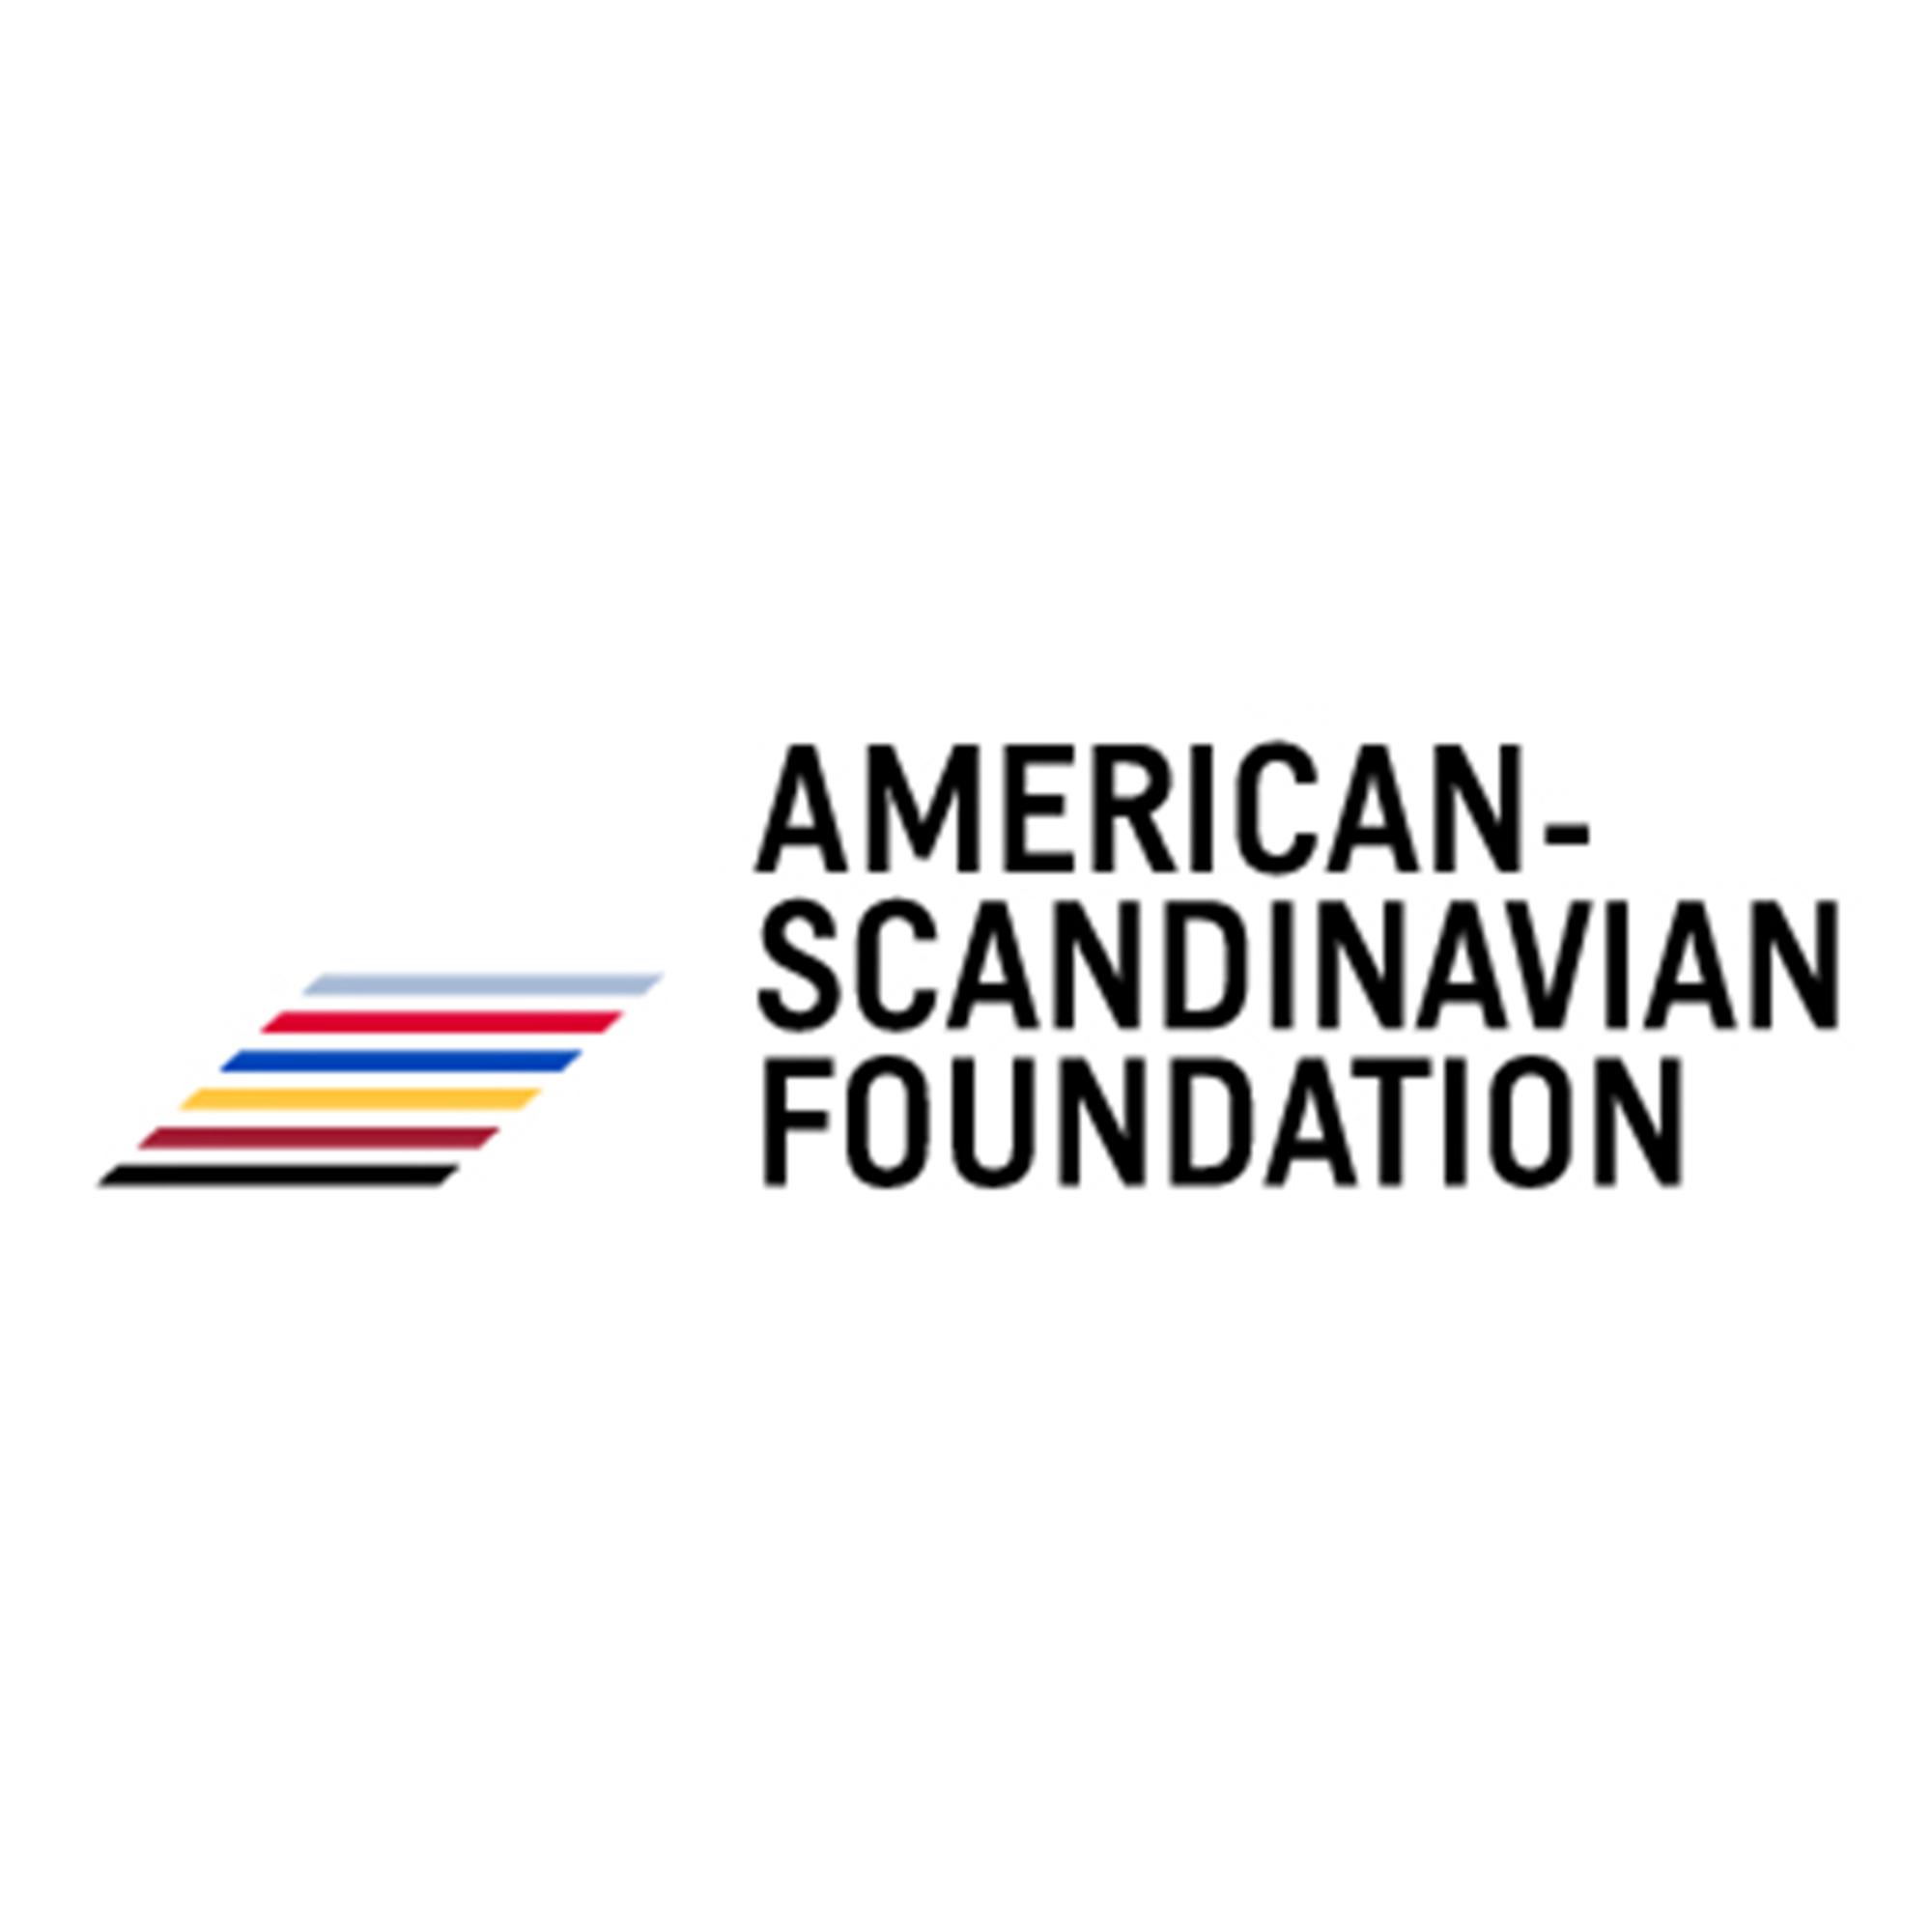 American Scandinavia Foundation